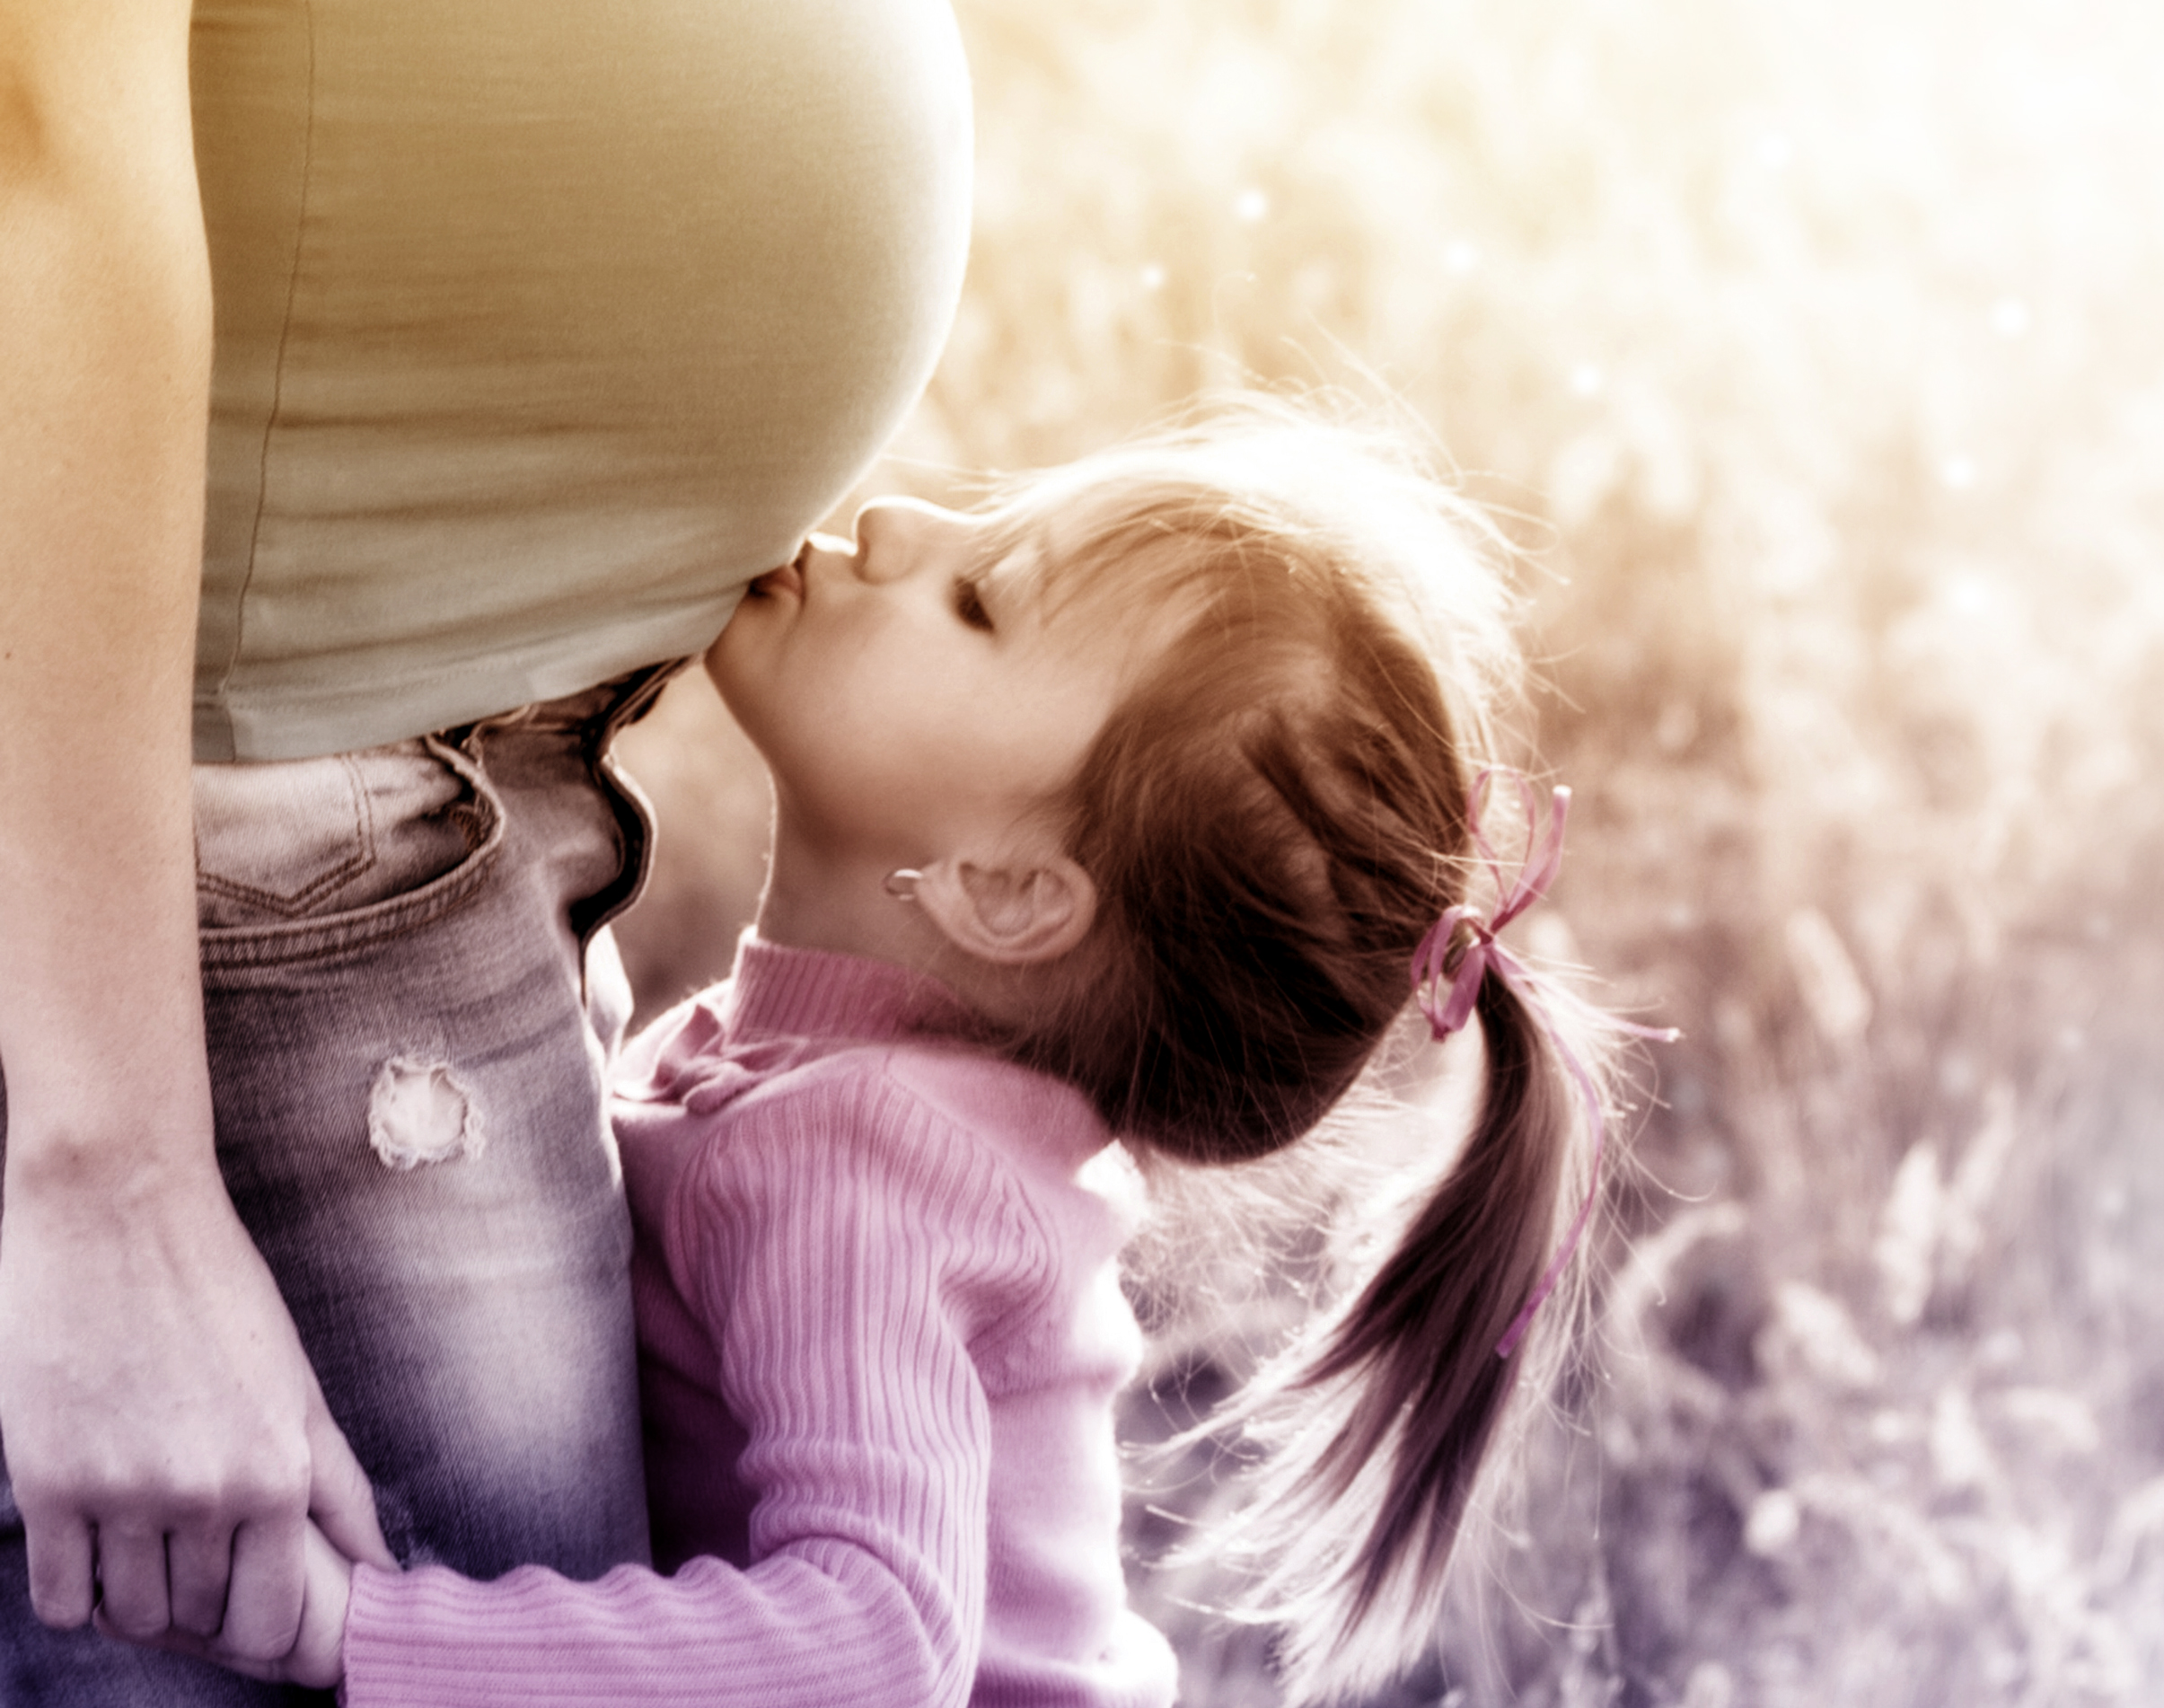 Little Blonde Girl Kissing Pregnant Mother, Adult, Motherhood, Parenthood, Parent, HQ Photo